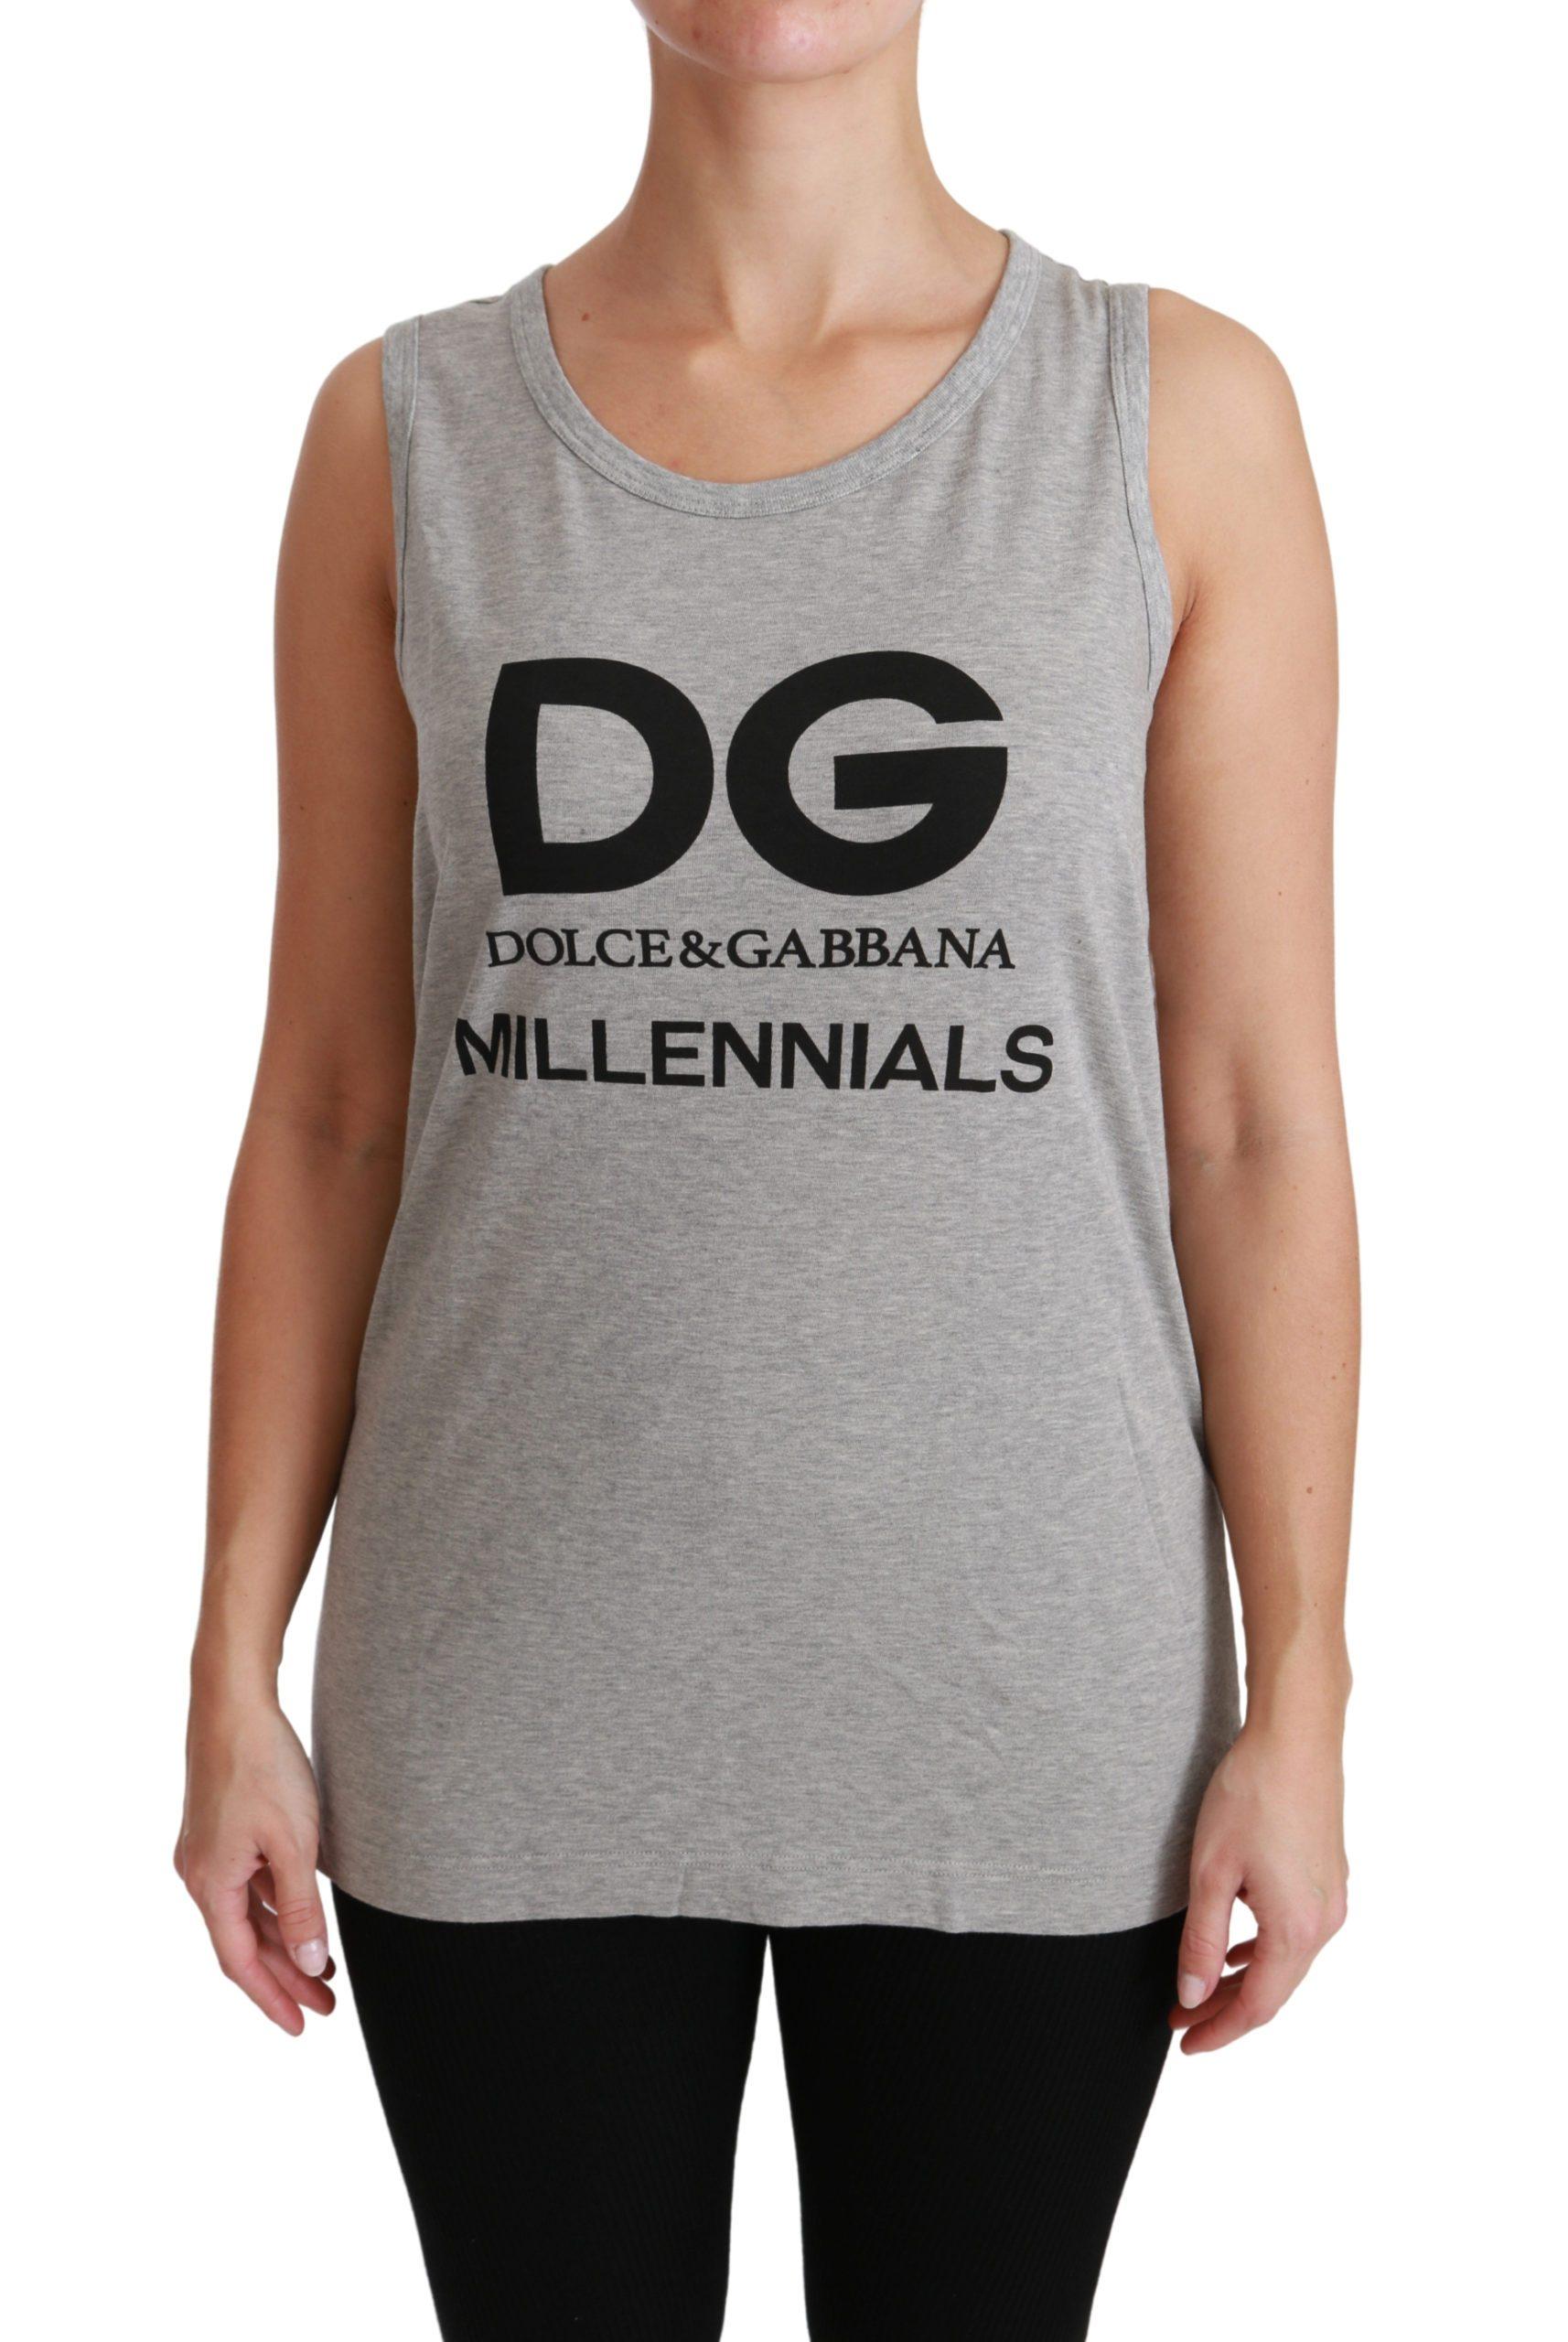 Dolce & Gabbana Women's DG Millennial Cotton T-Shirt Gray TSH4447 - IT36   XS